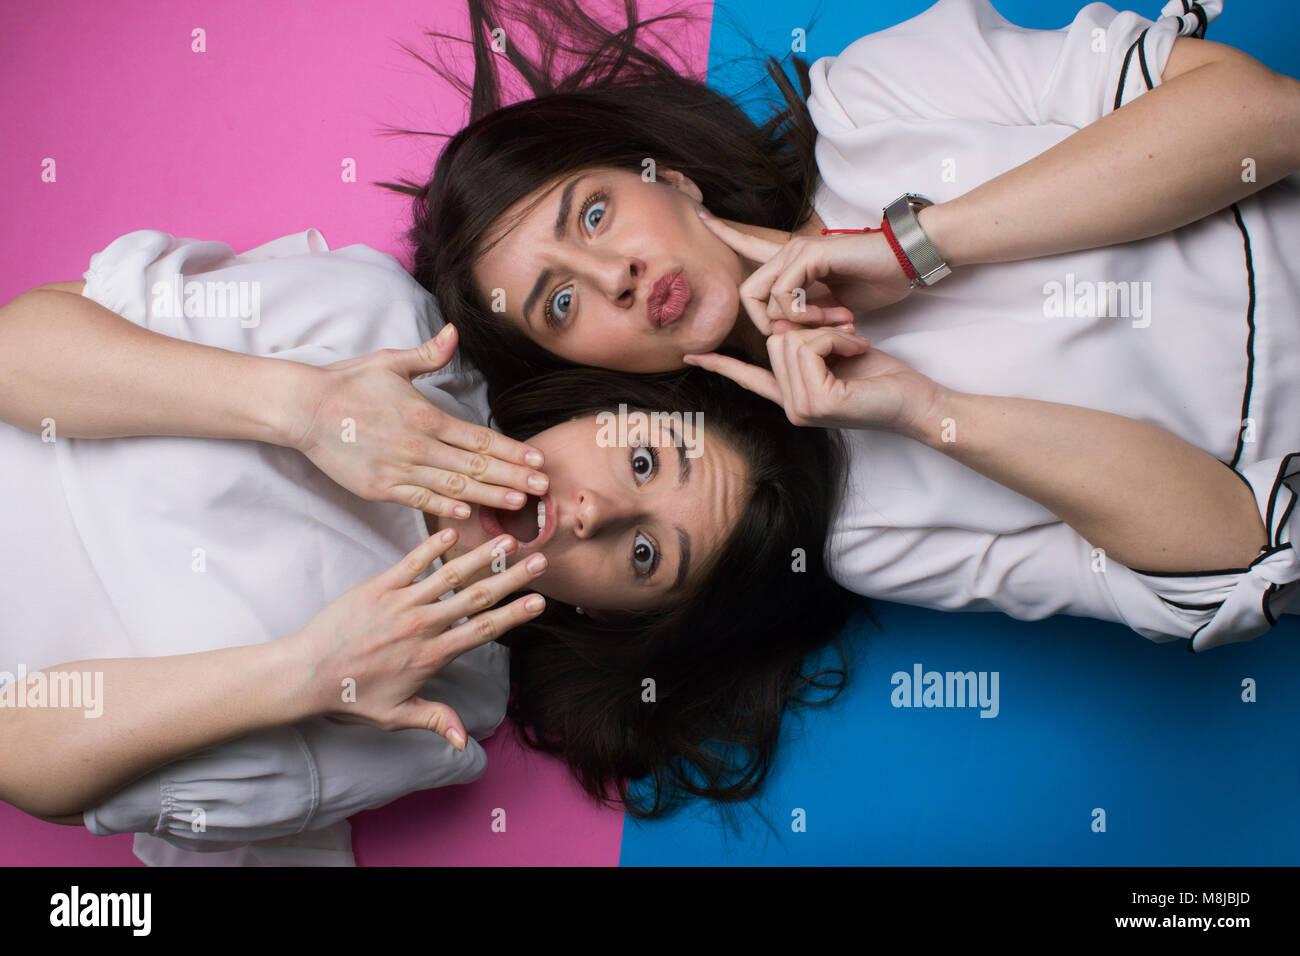 girls making faces - Stock Image